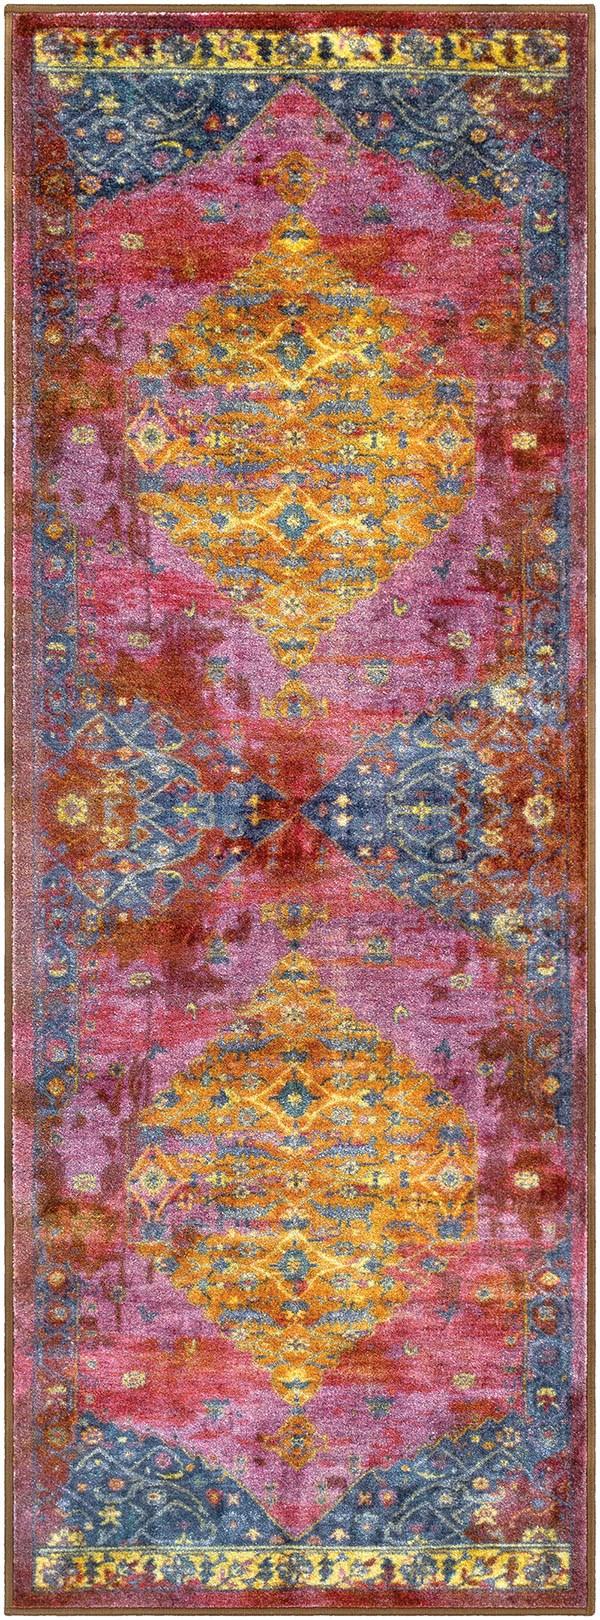 Lilac, Dark Purple, Red, Yellow, Pink, Dark Blue Bohemian Area Rug